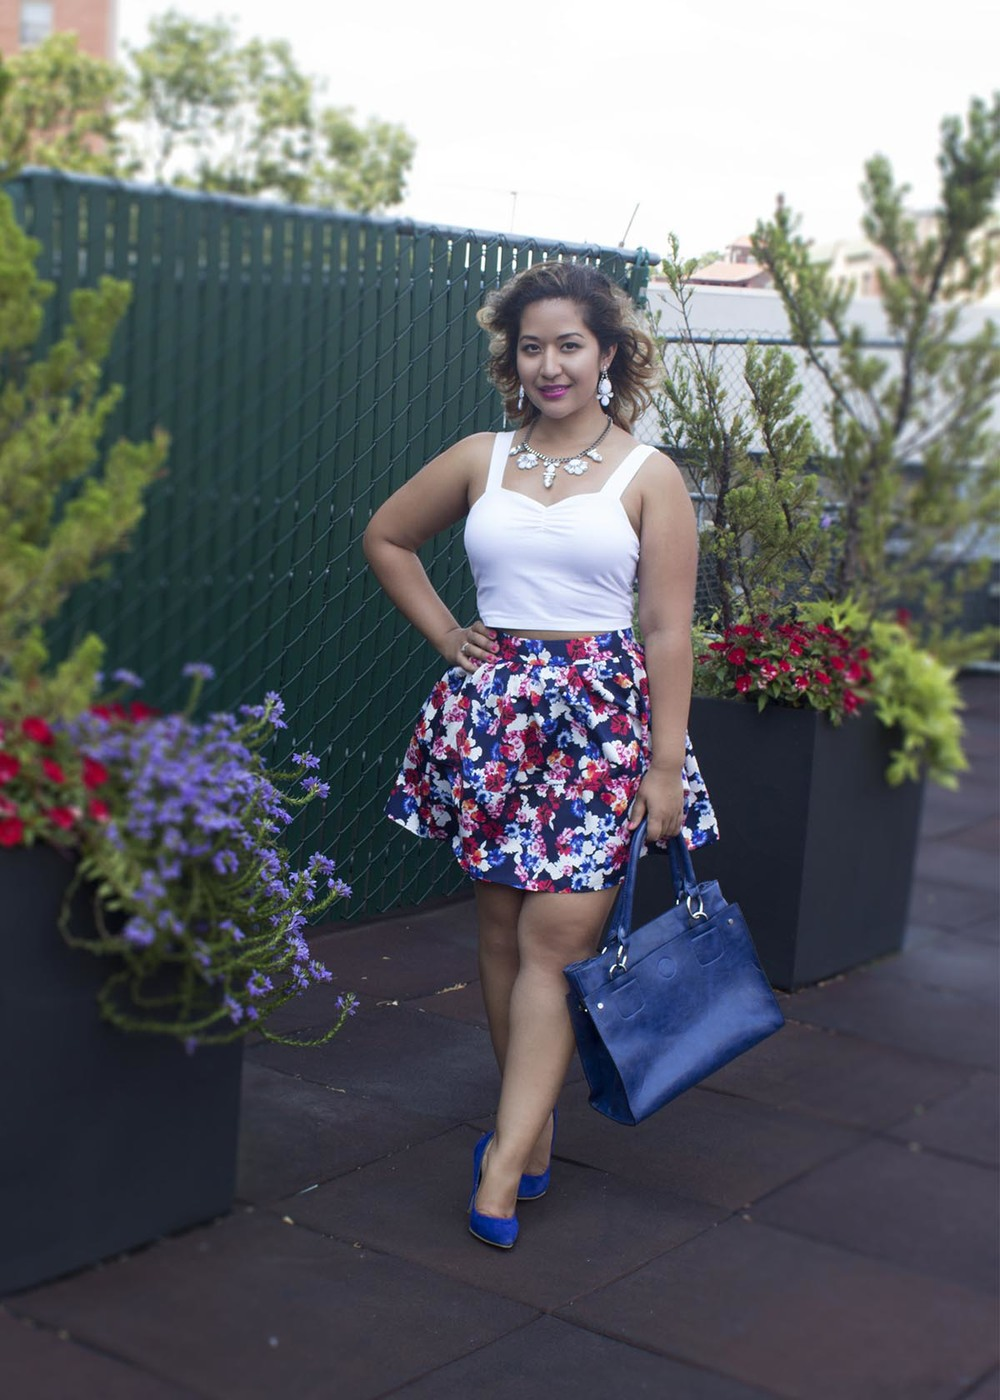 Floral Skirt3.jpg